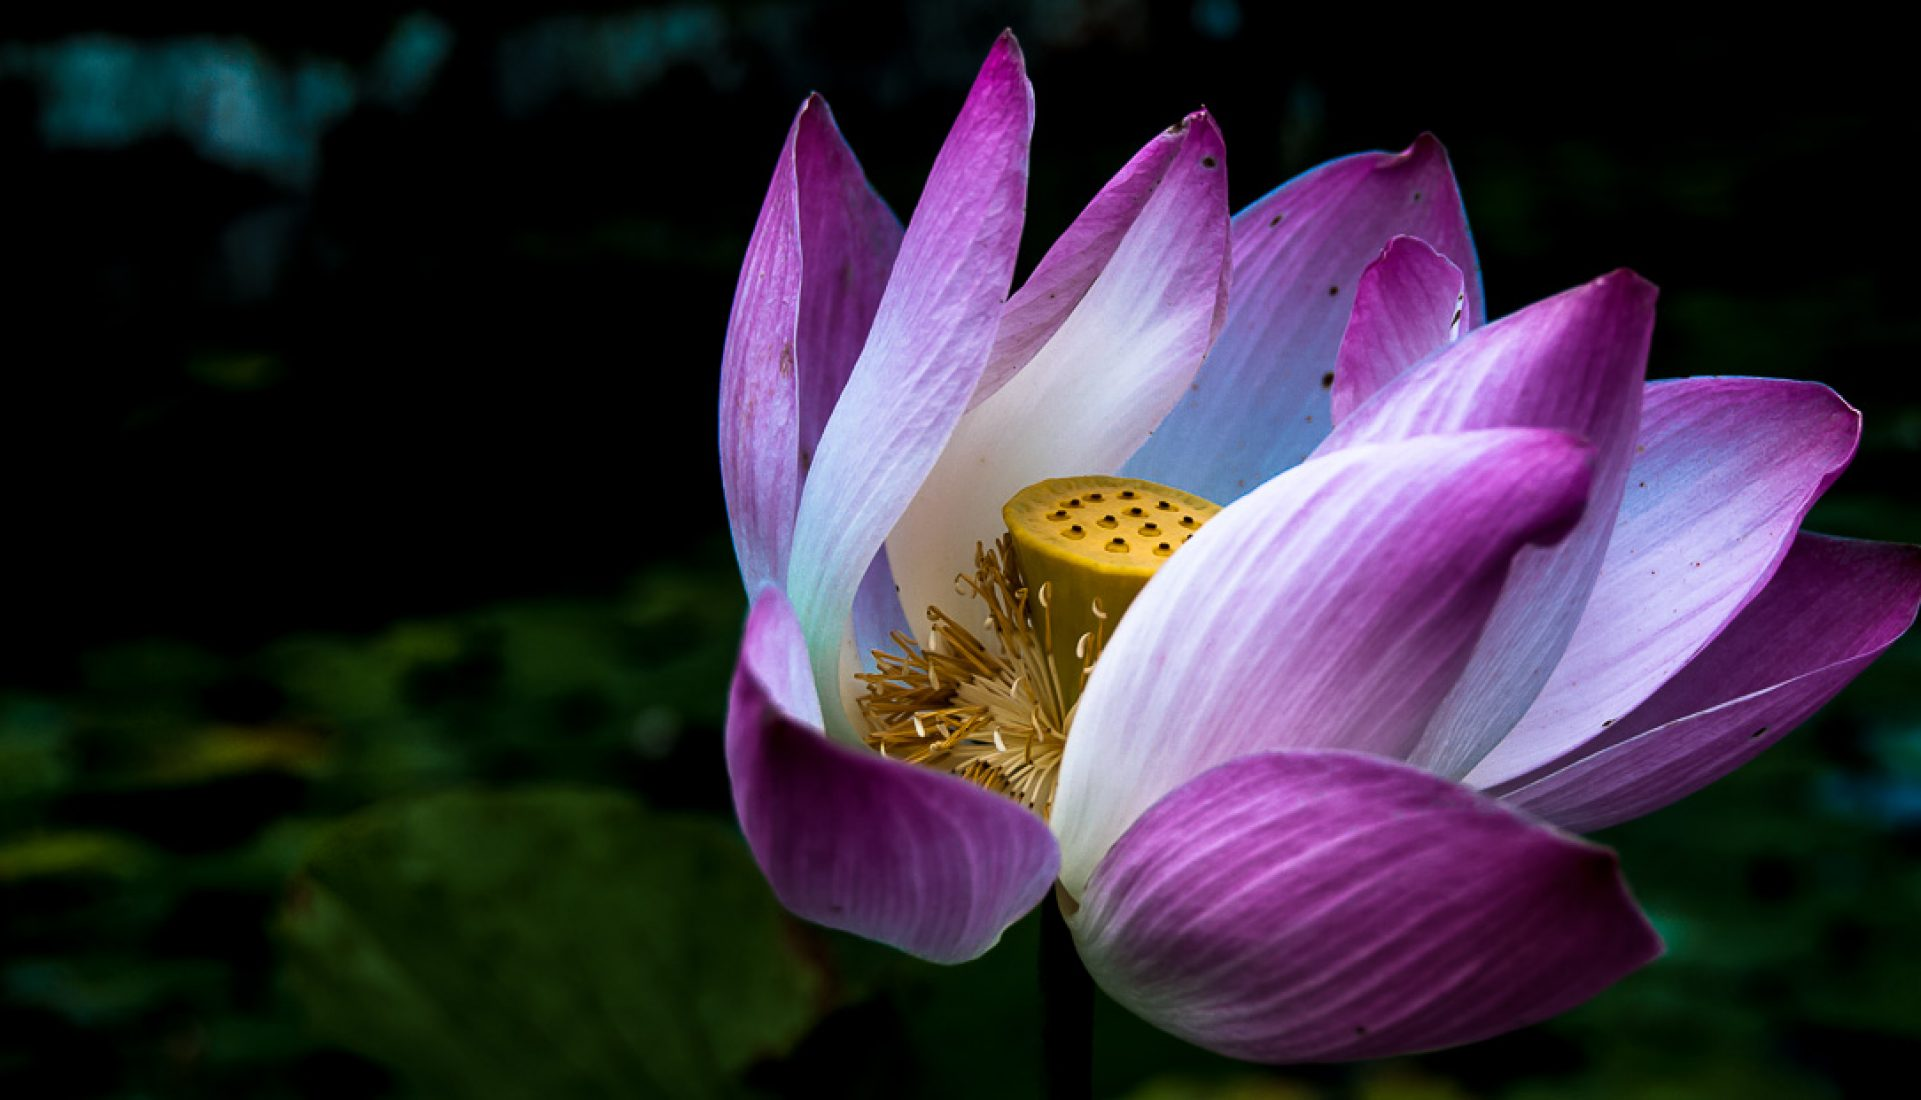 A Single Bloom – a Single Image